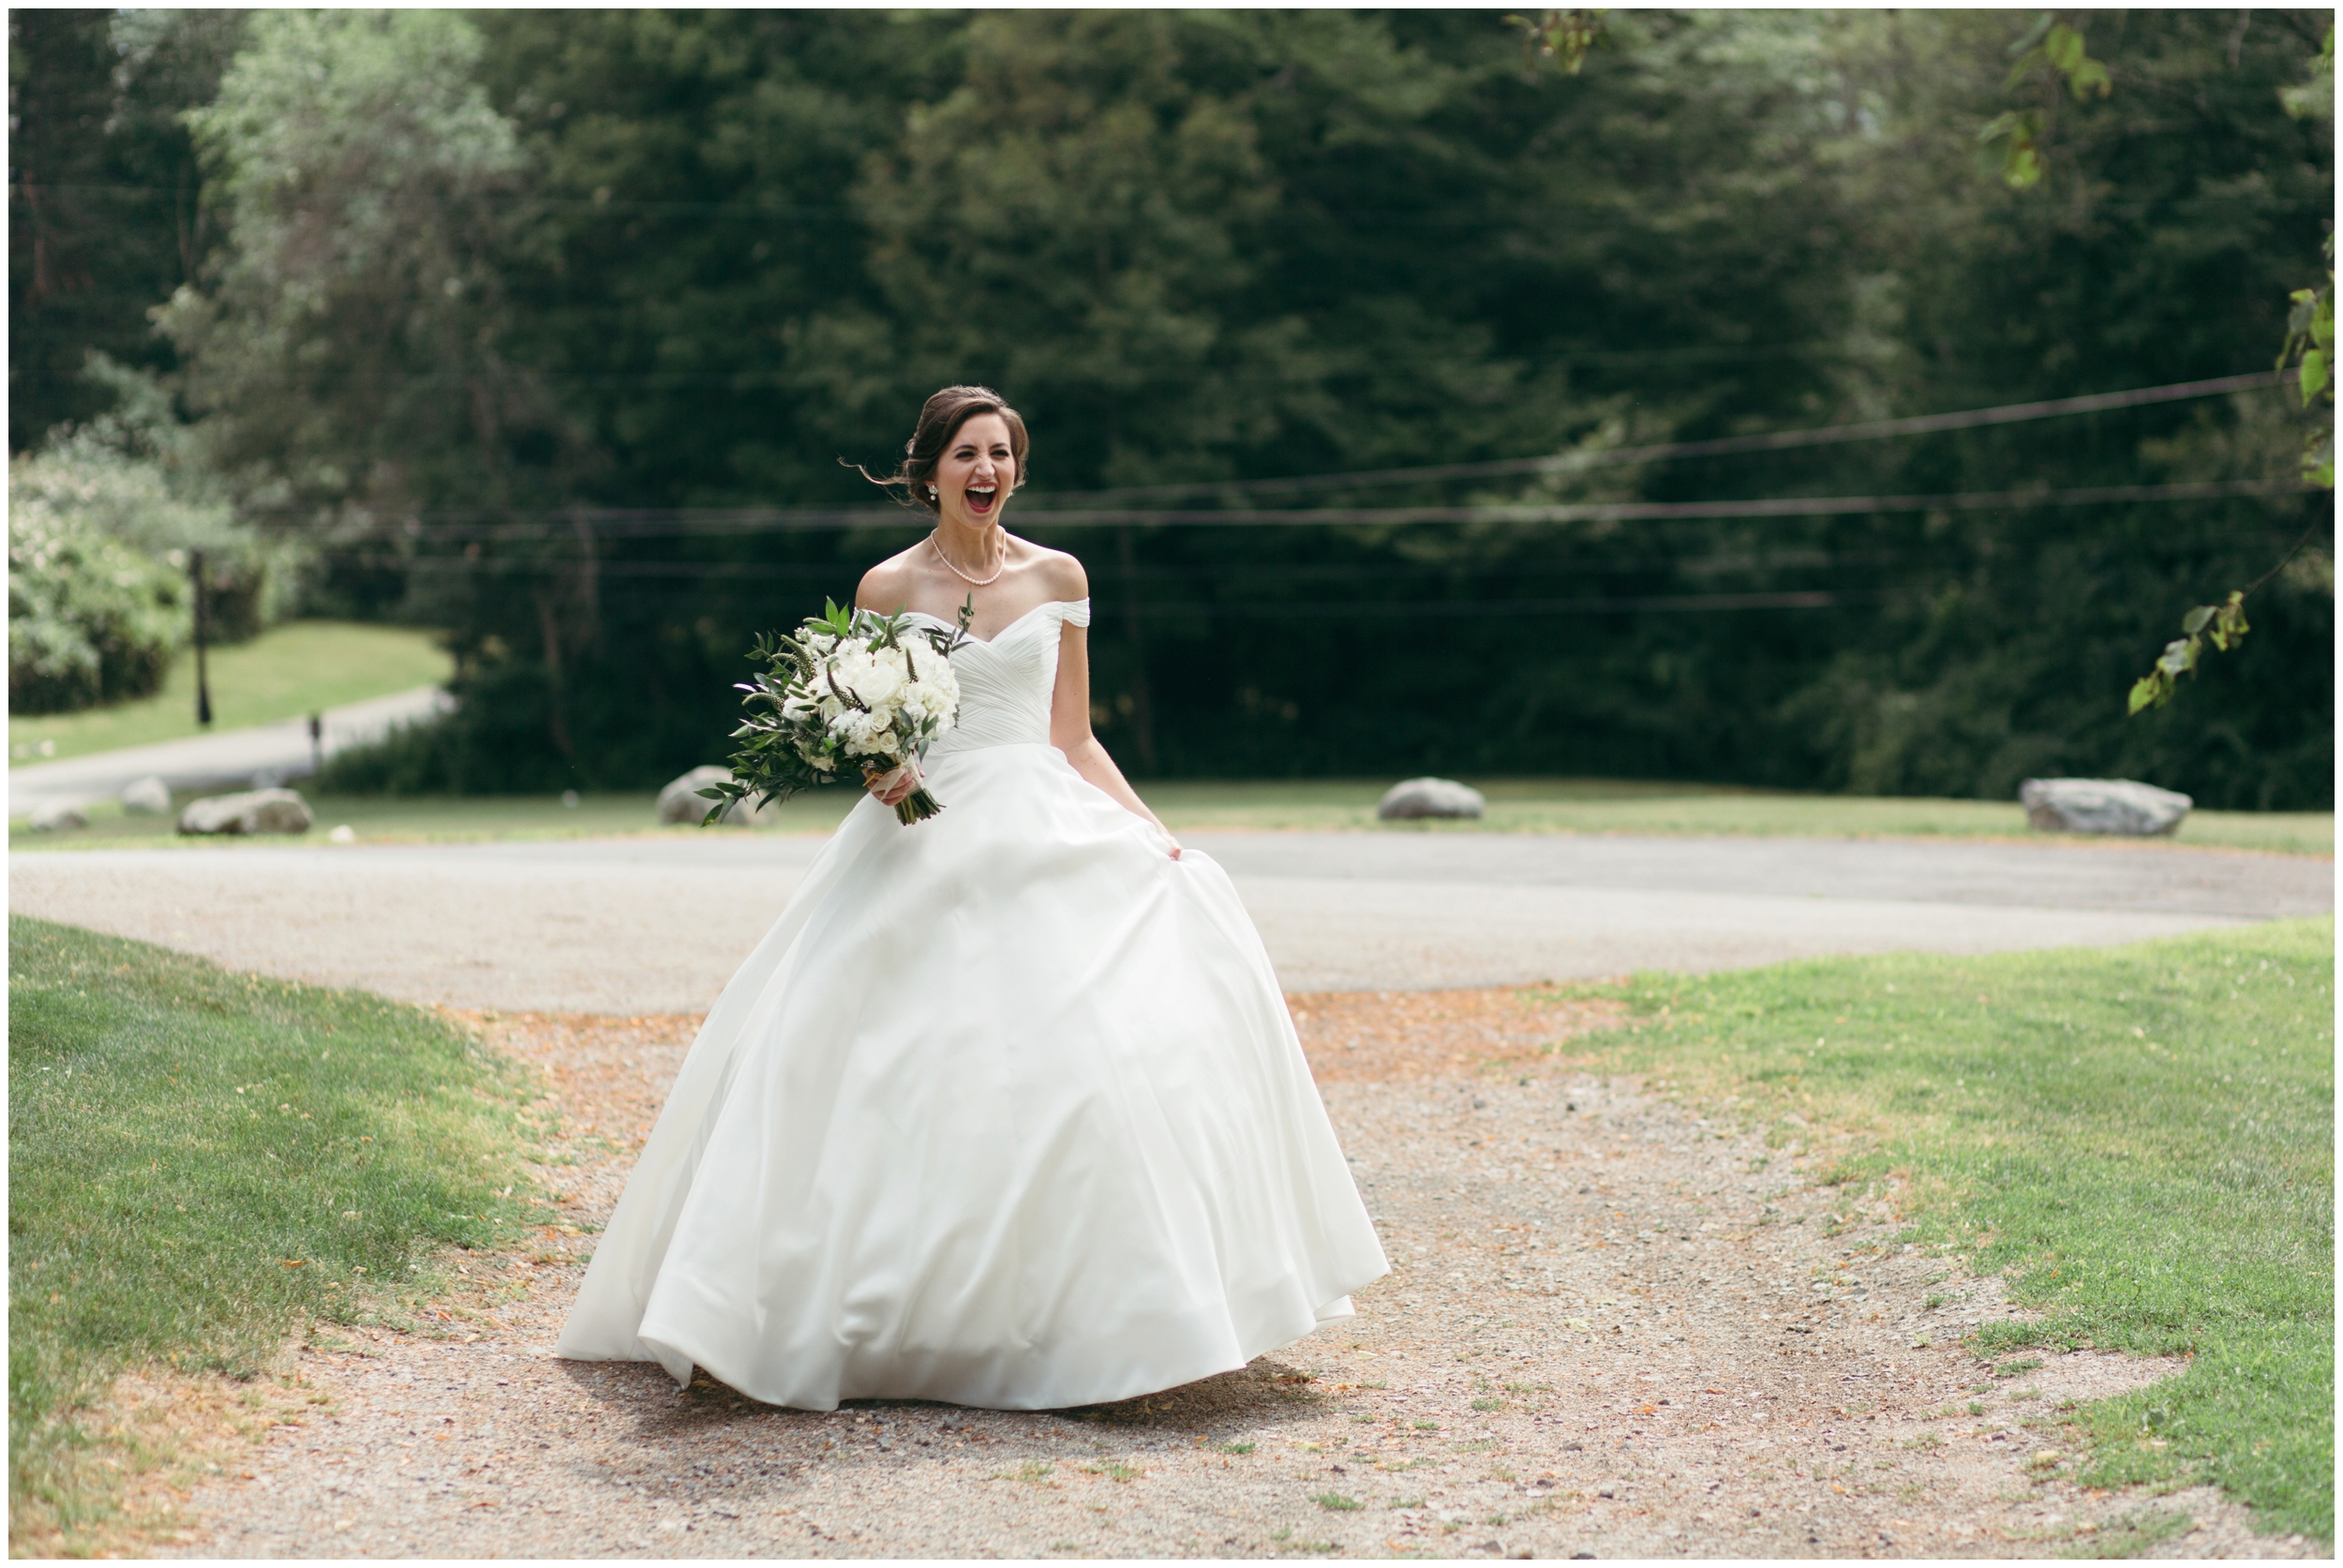 Willowdale-Estate-Wedding-Bailey-Q-Photo-Boston-Wedding-Photographer-009.JPG